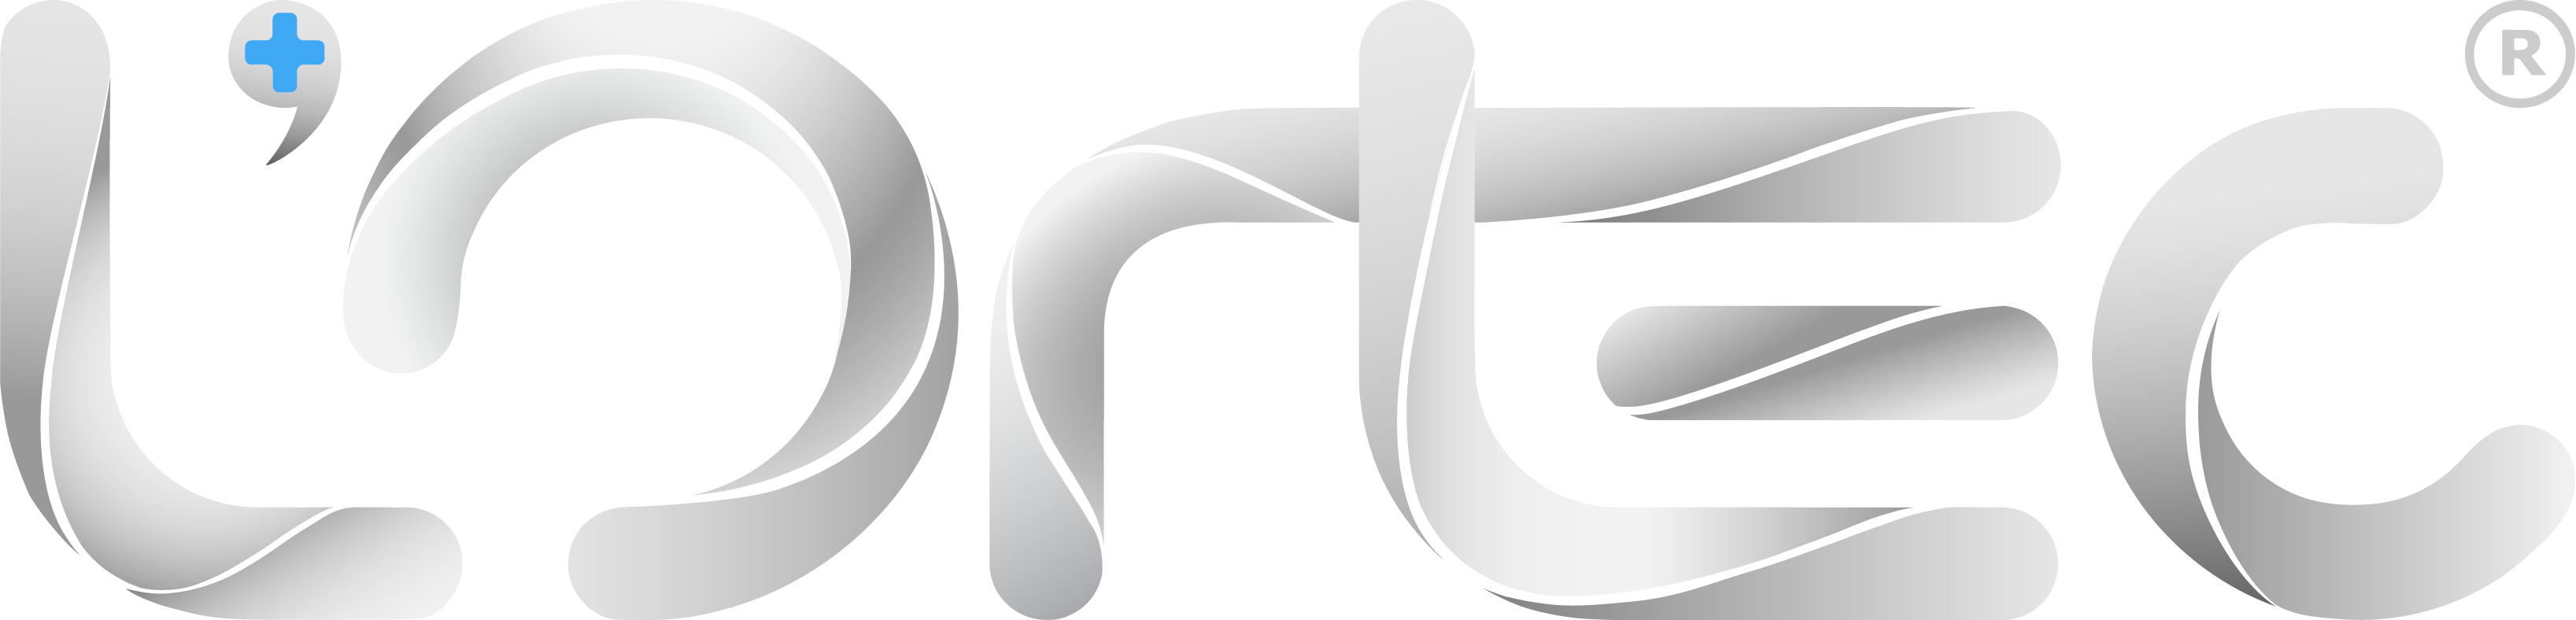 Lortec logo TRANSPARENTE